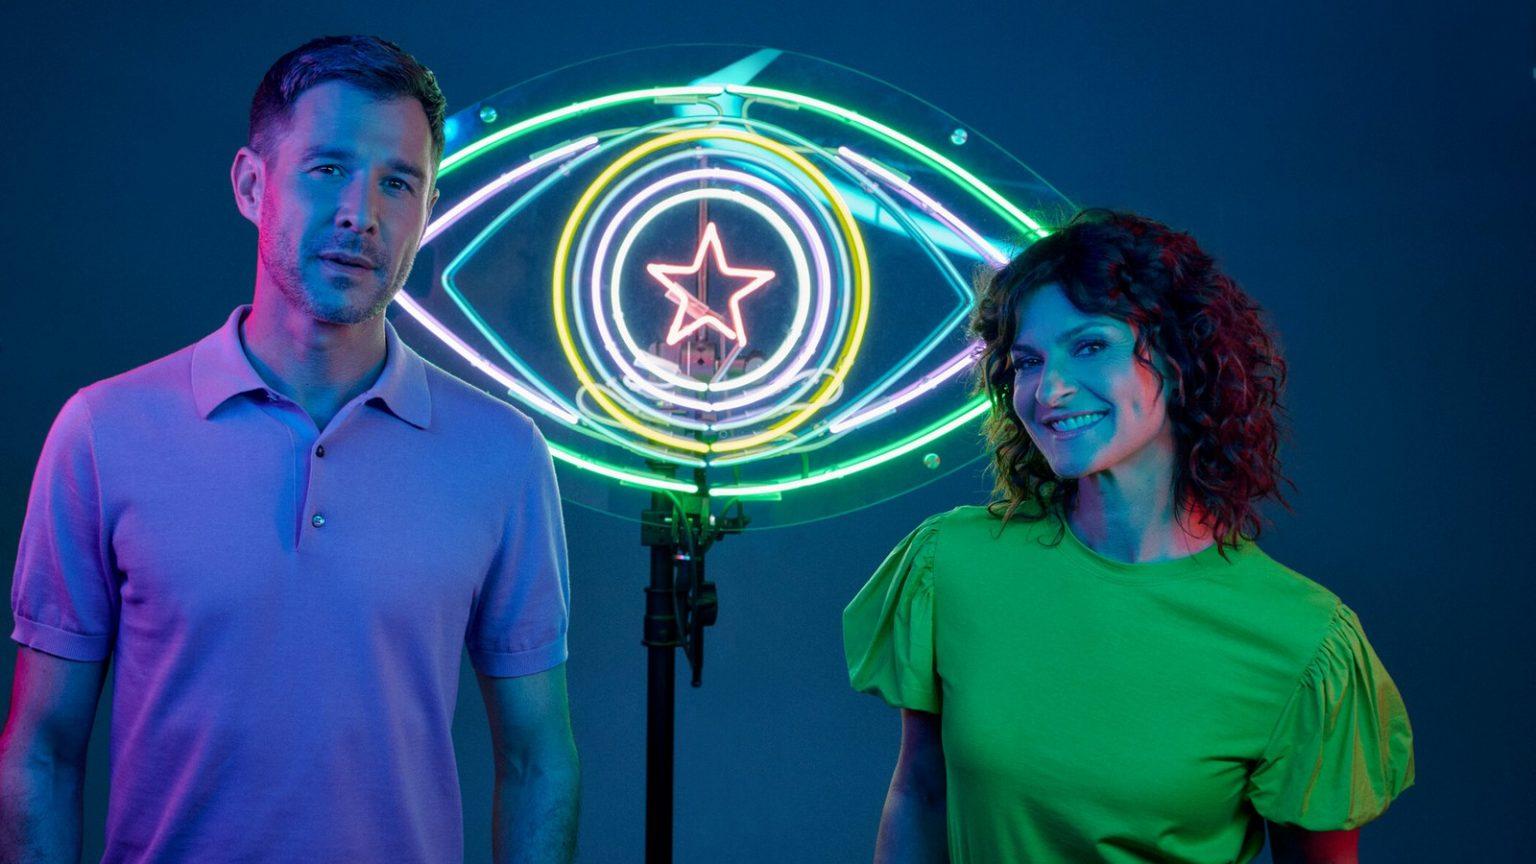 Promi Big Brother 2021: Kandidaten, Moderatoren ...